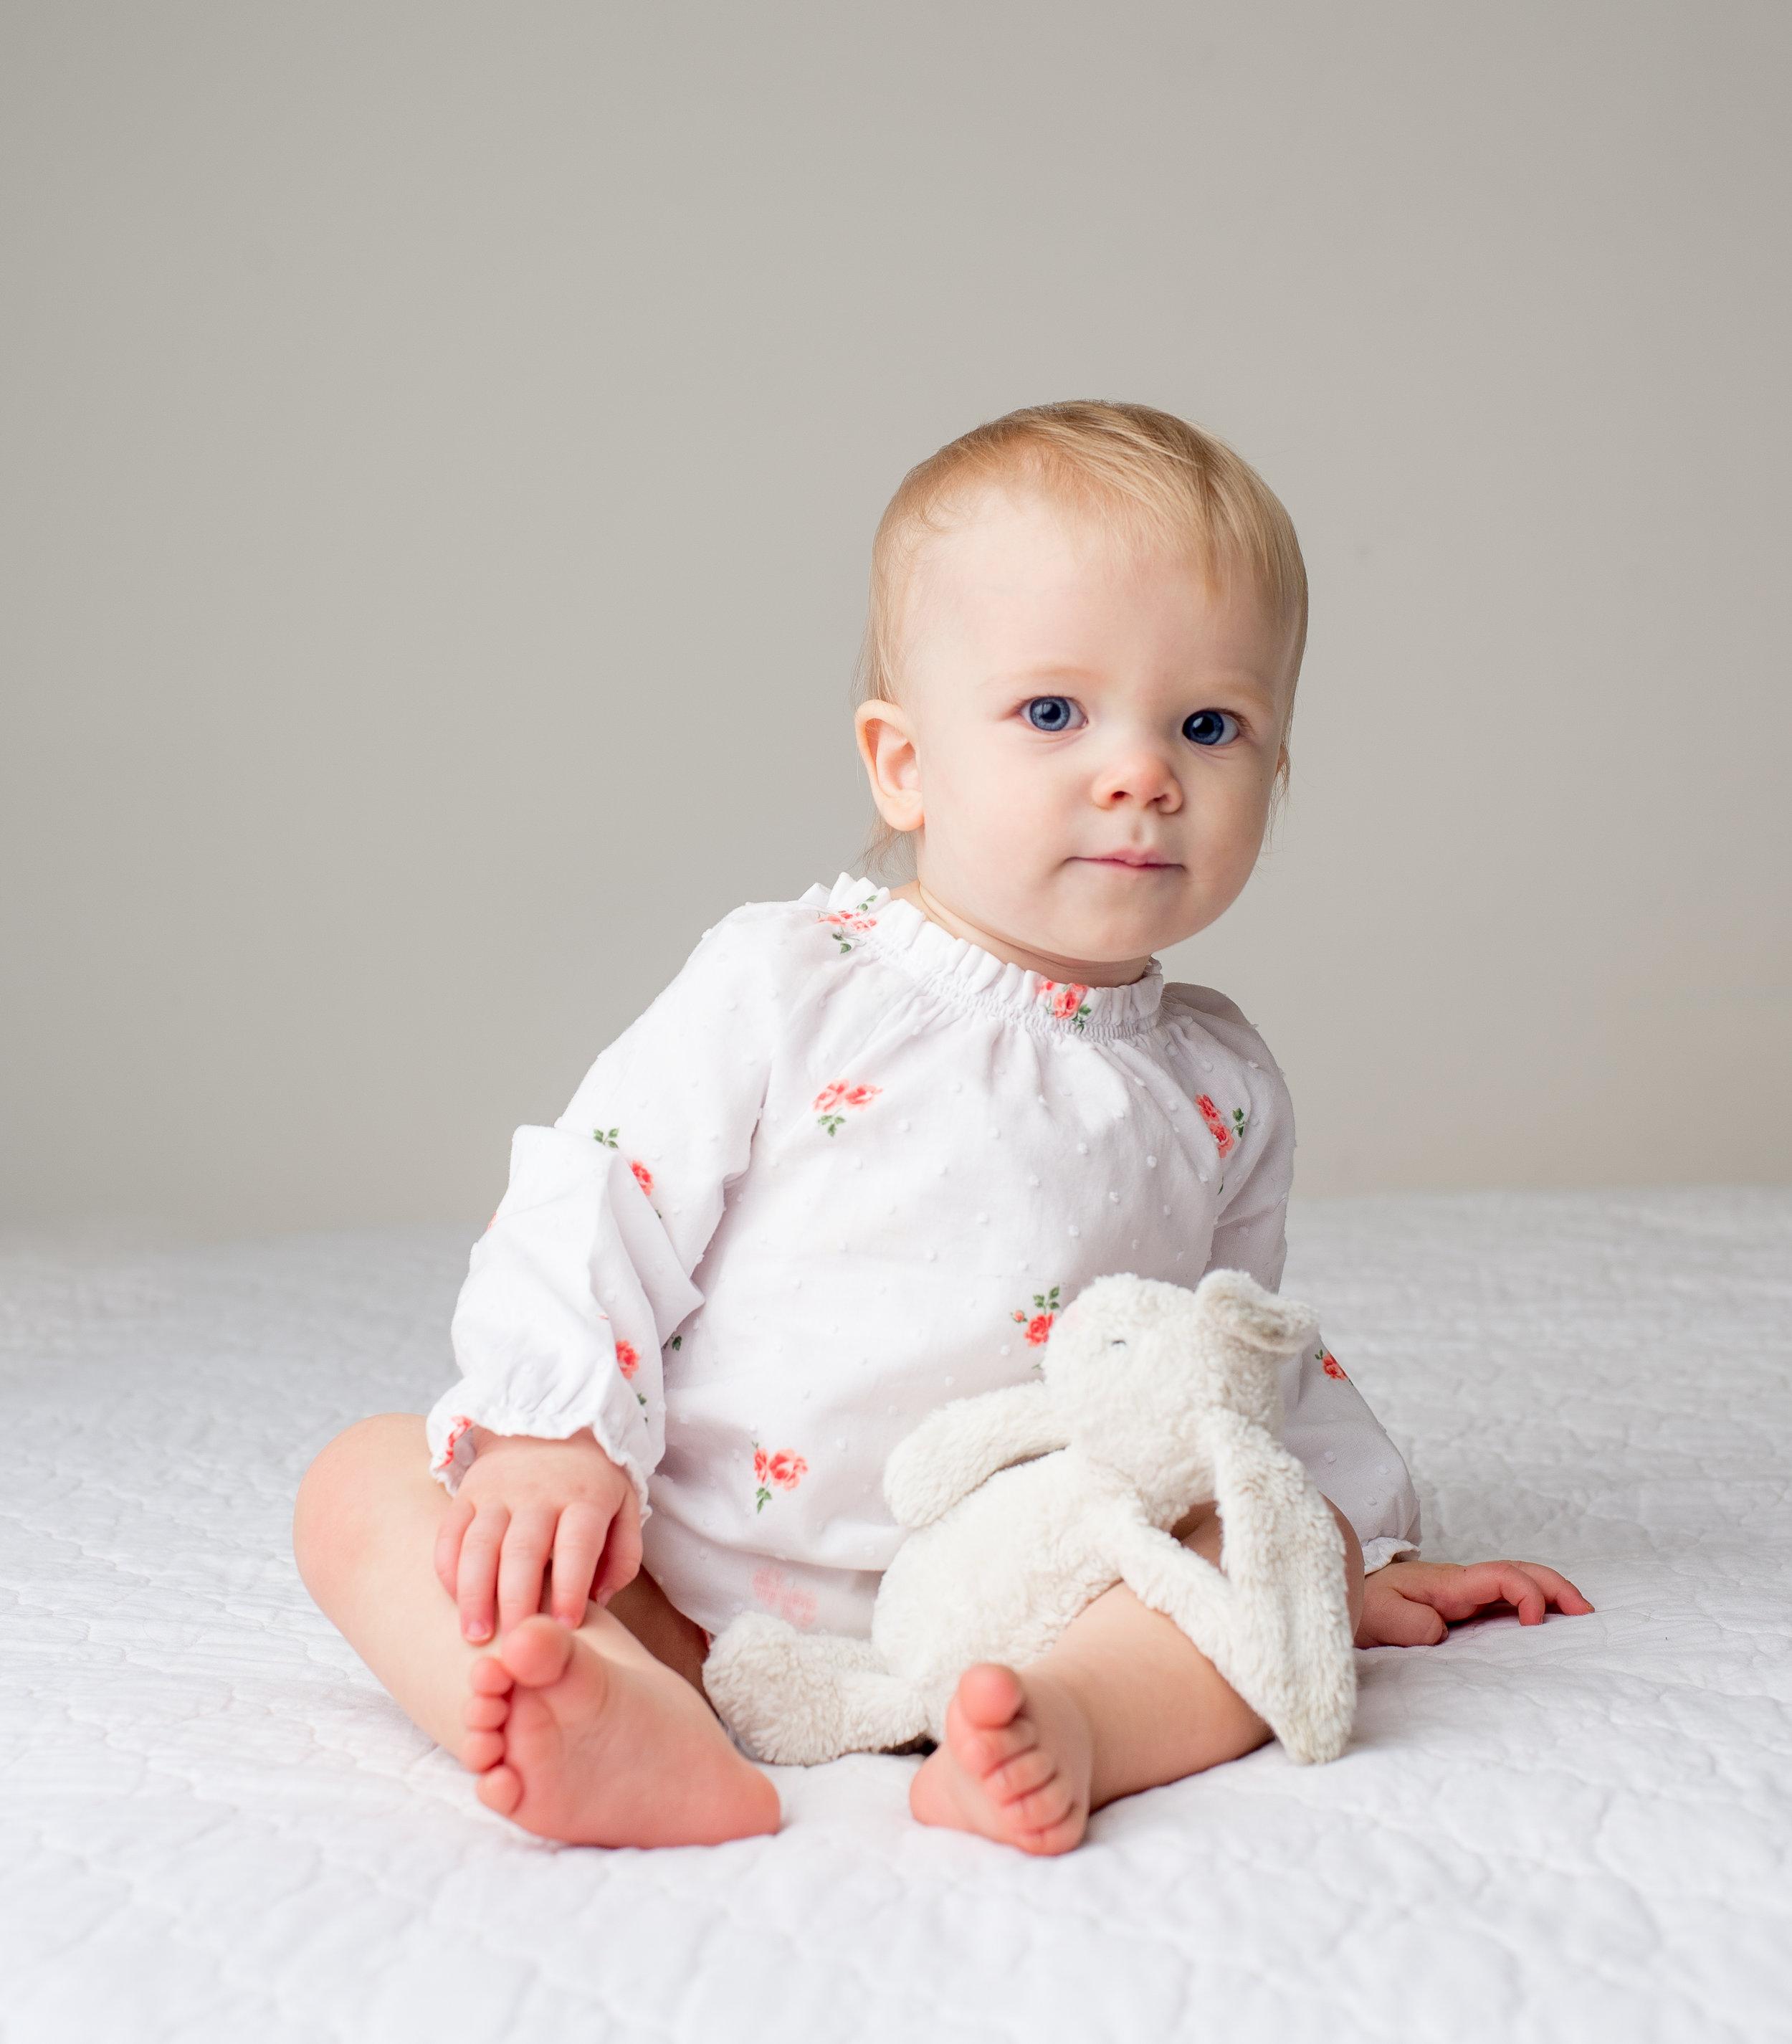 Armatophotography-newborn-family-portraits-Clarksburg-Maryland